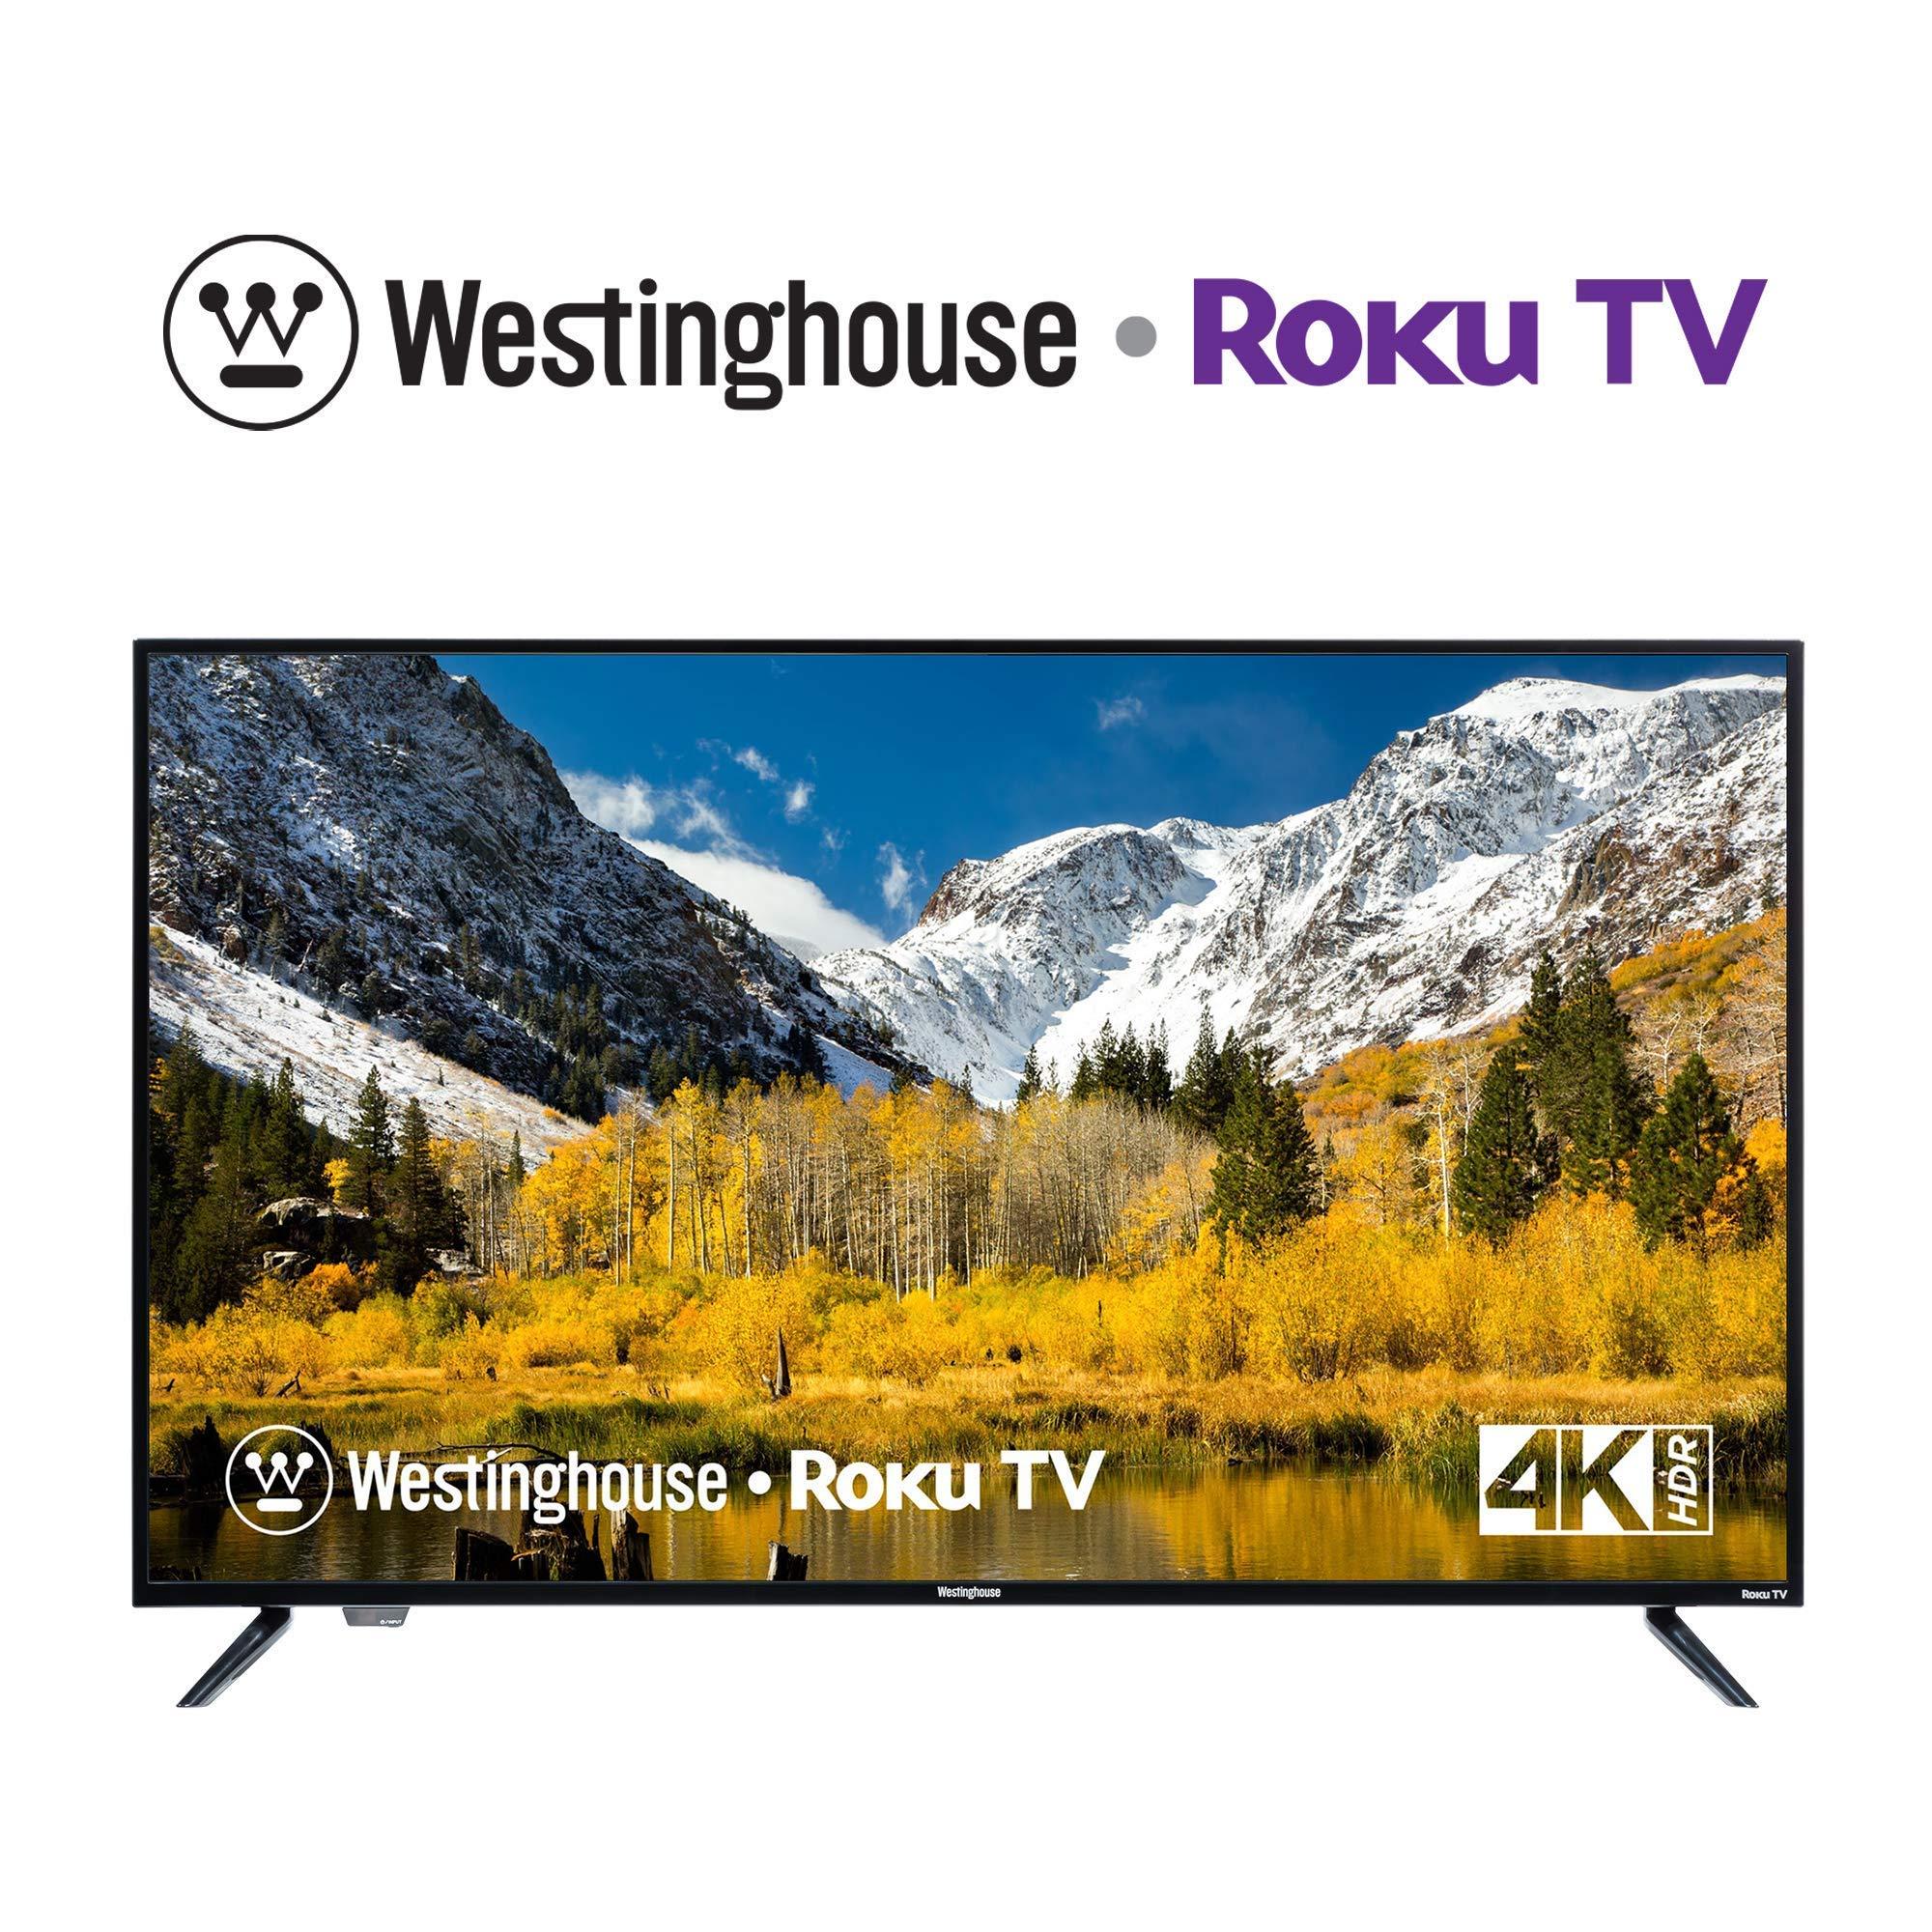 Westinghouse 43 inch Roku 4k Ultra HD LED Smart TV with HDR (Renewed)- Buy  Online in Qatar at qatar.desertcart.com. ProductId : 181794058.